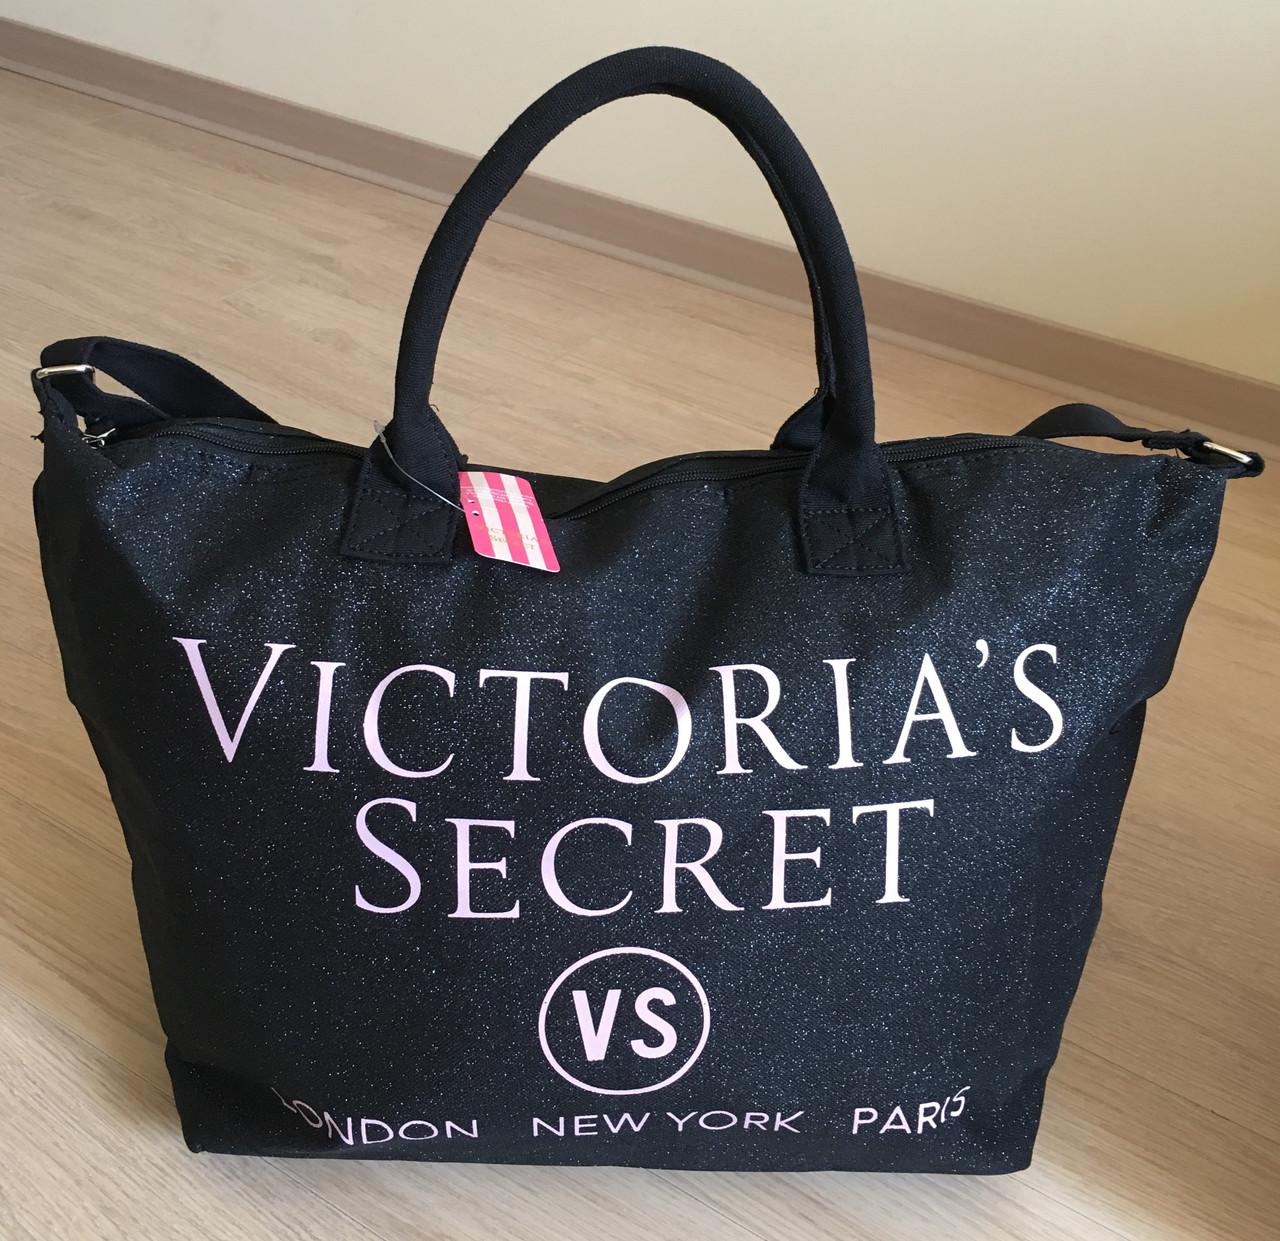 9fd3864a4b86 Сумка пляжная Victoria's Secret - Интернет-магазин